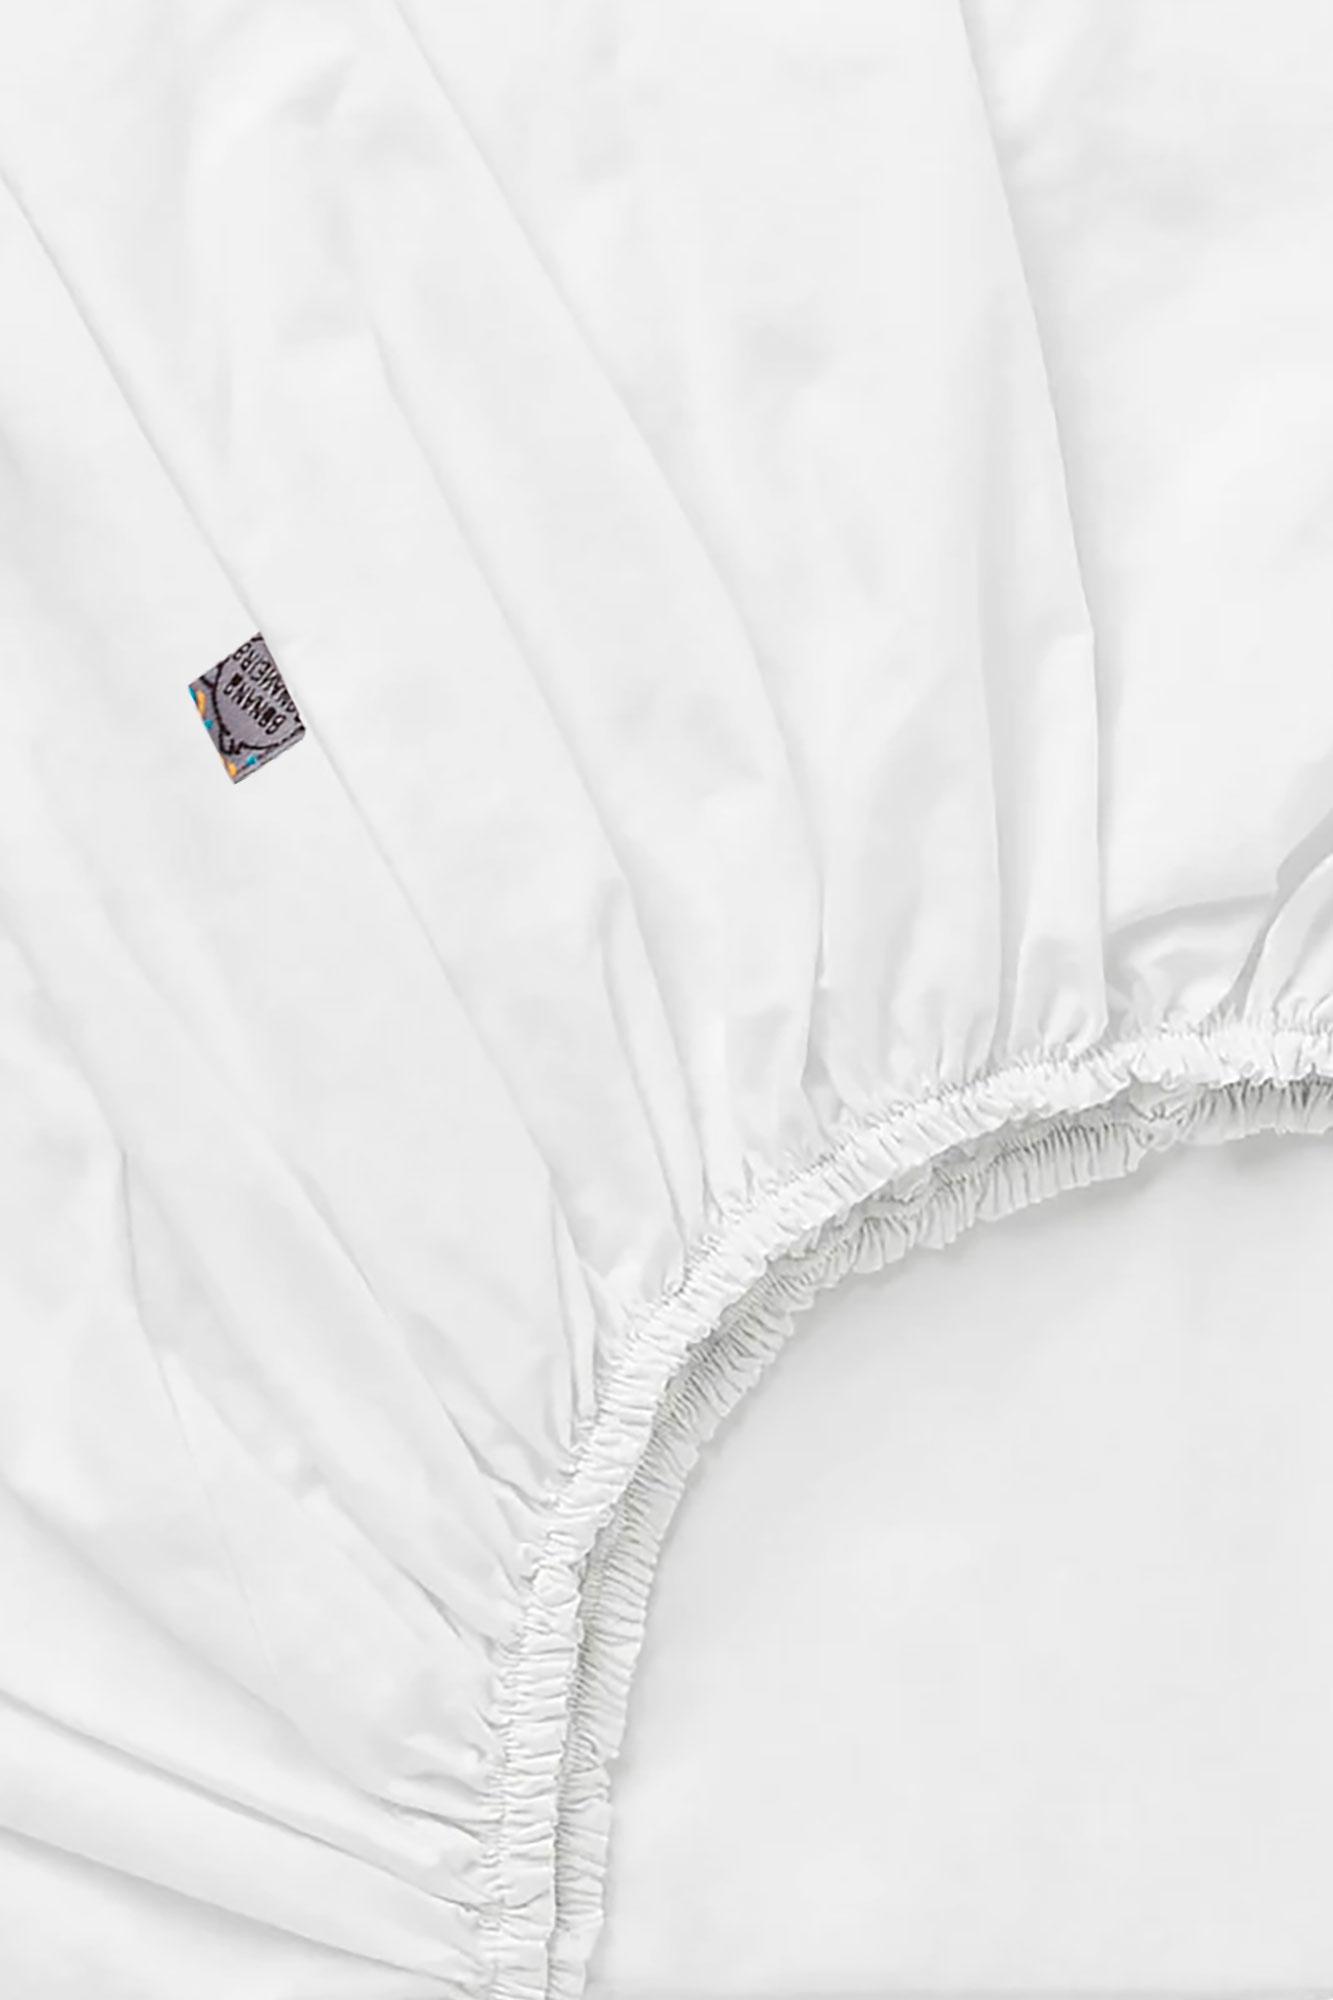 Lençol de elástico mini cama Branco